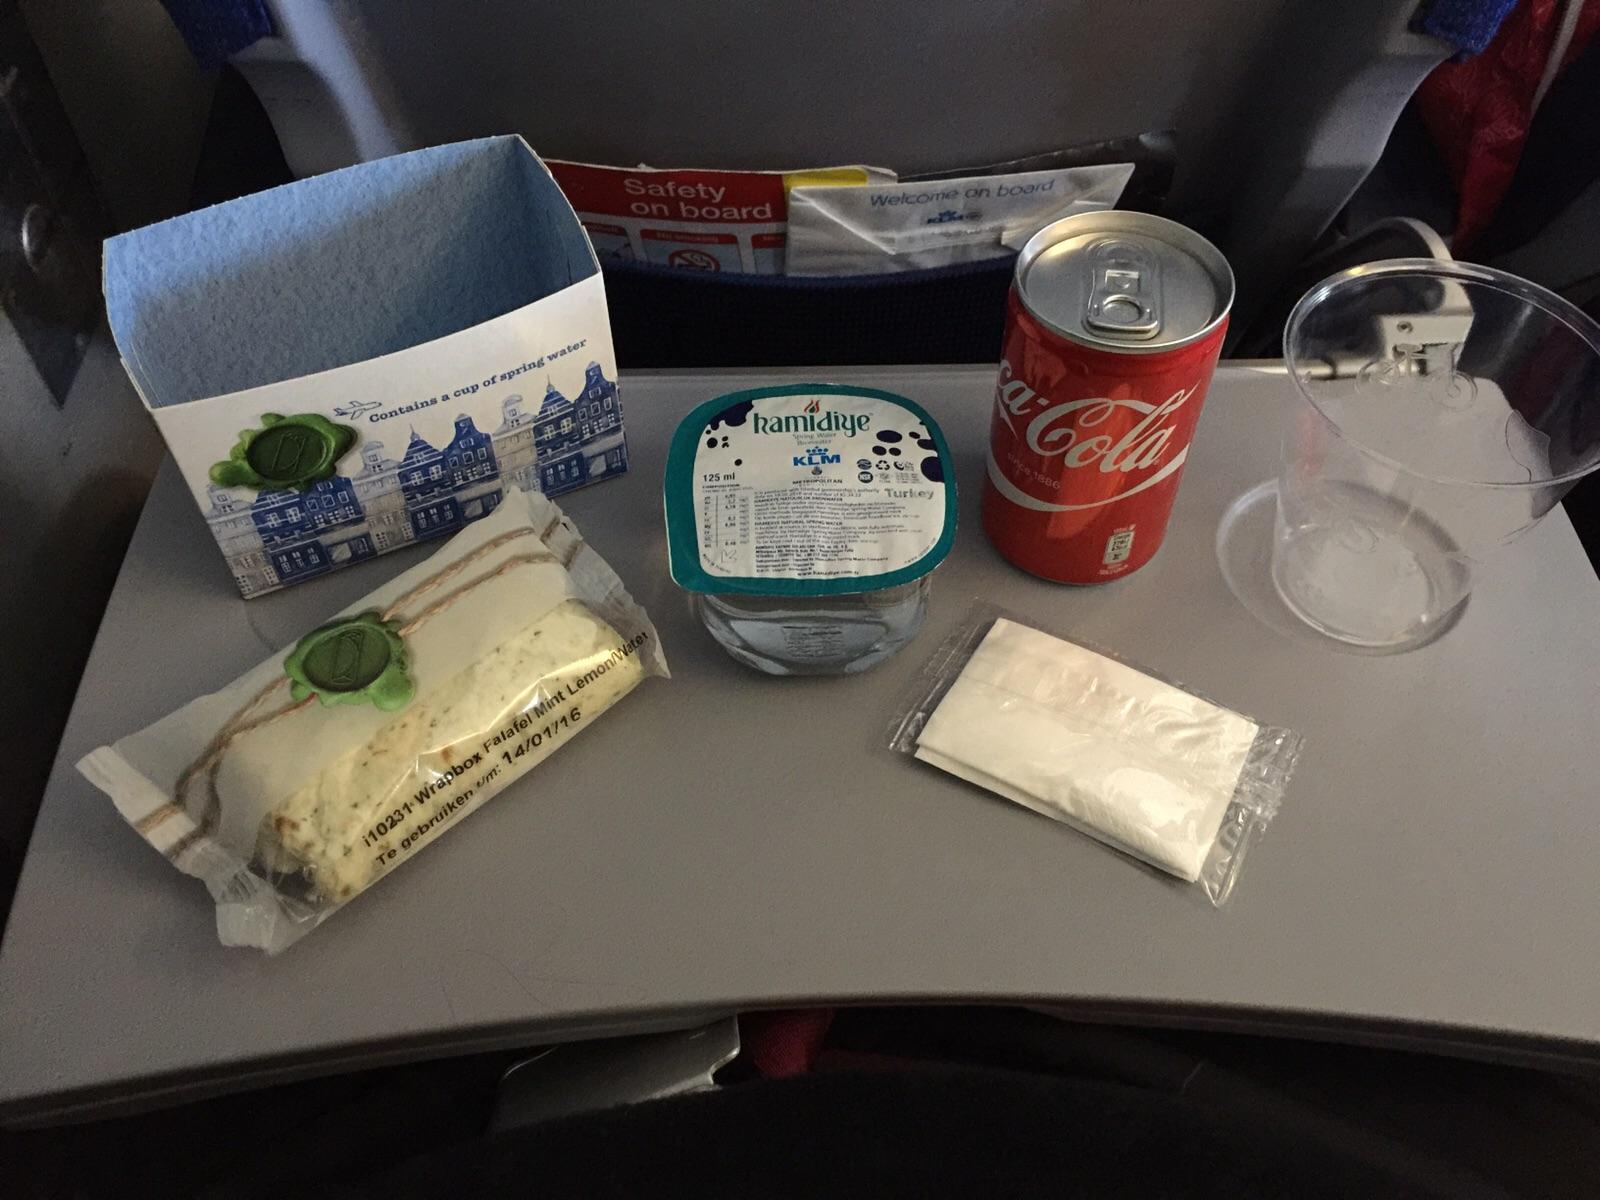 KLM_Inflight Meal_KL1131_Amsterdam_Copenhagen_Jan 2016_003